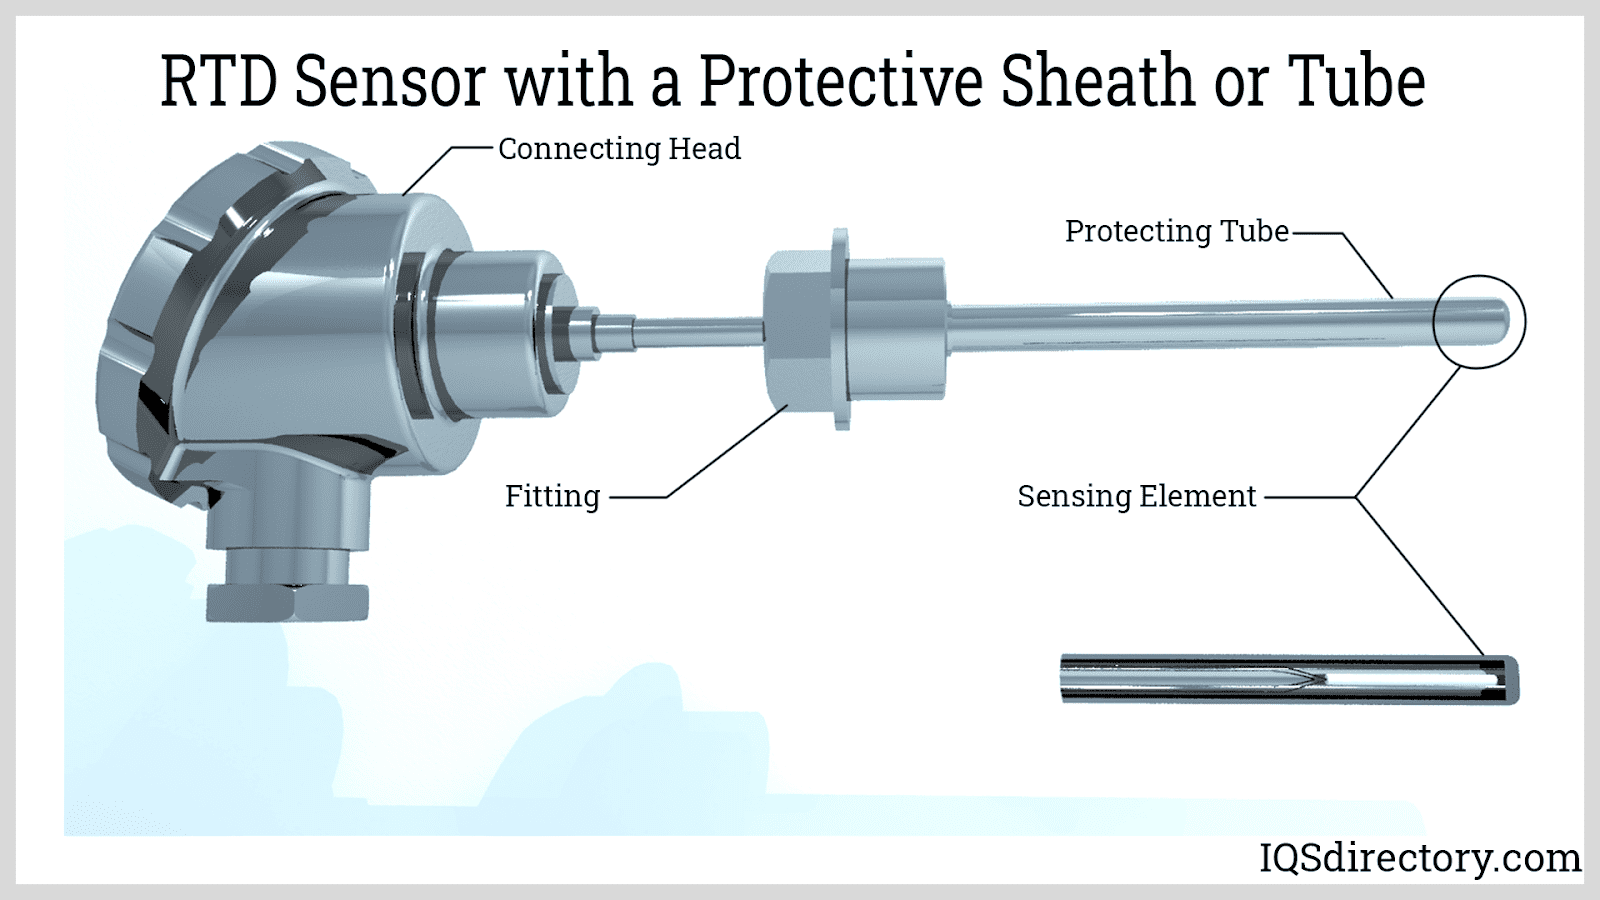 RTD Sensor with a Protective Sheath or Tube